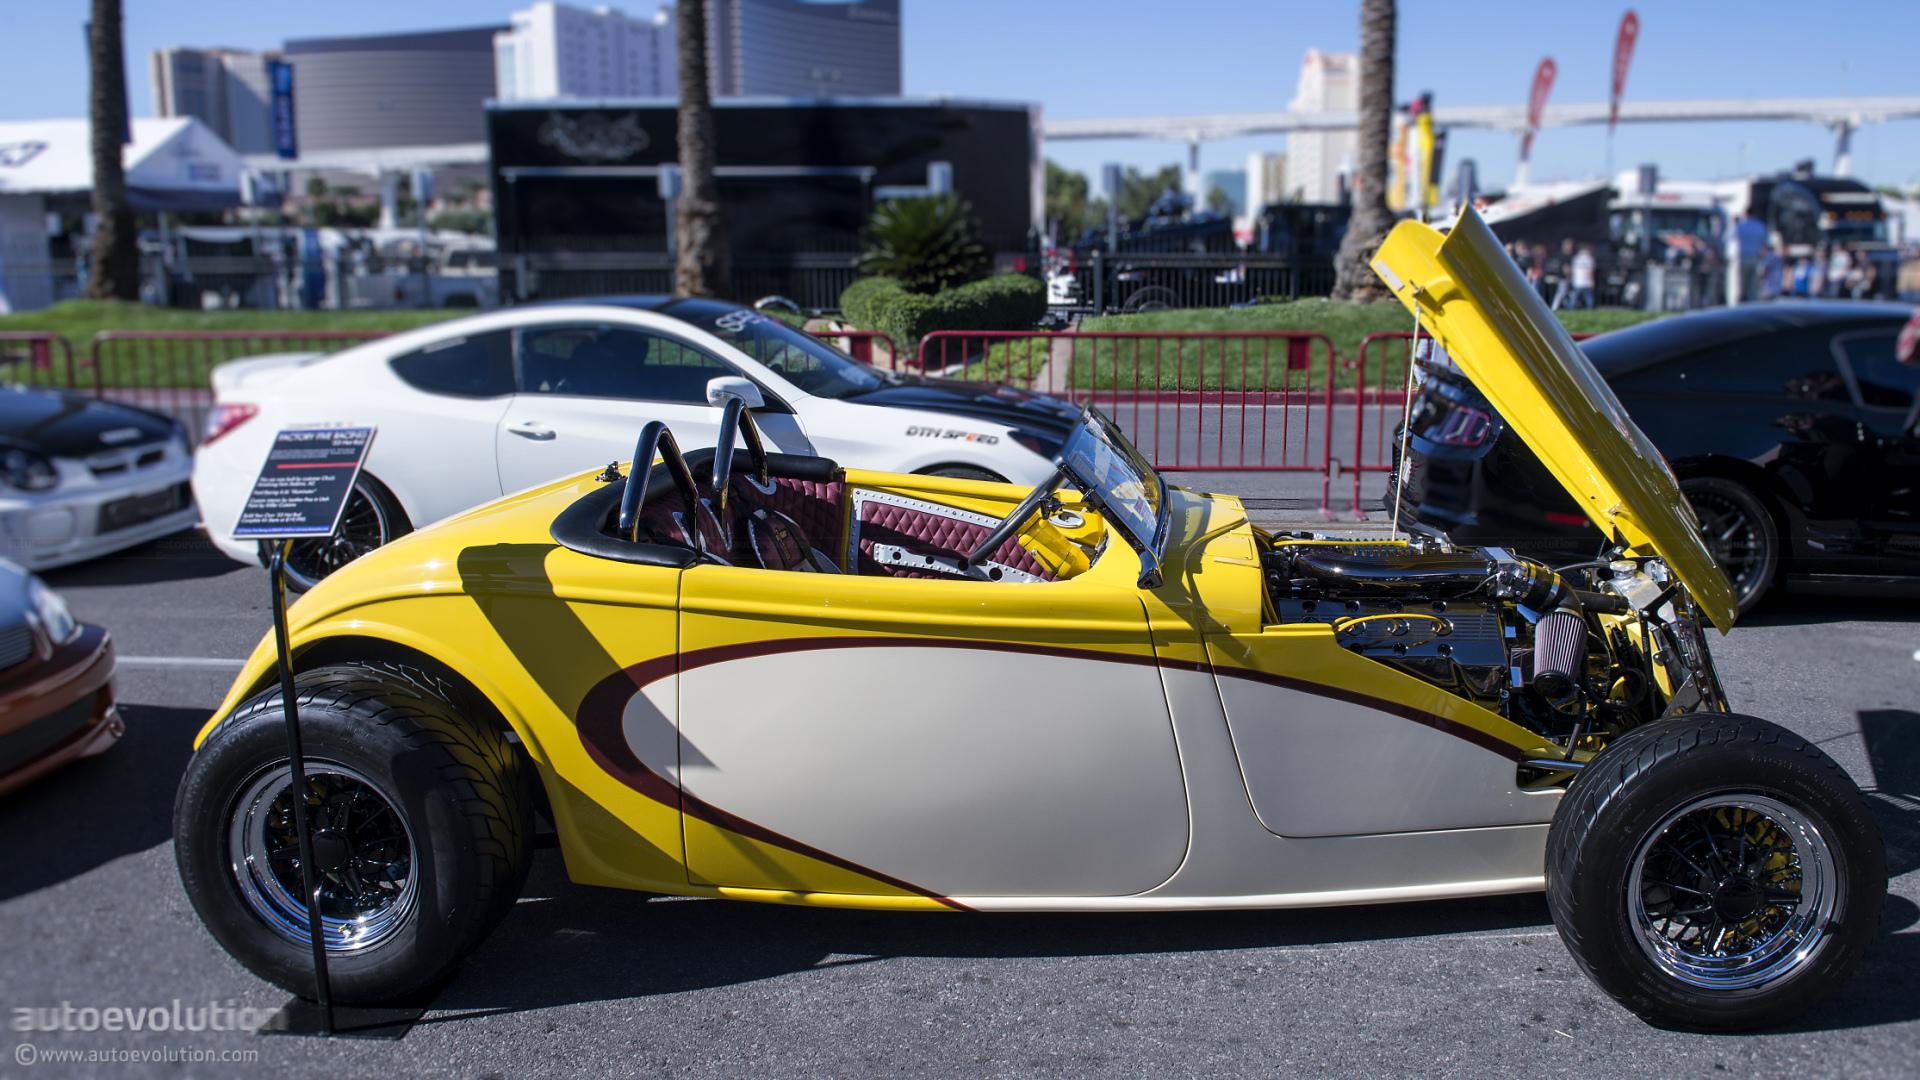 2012 SEMA: Factory Five \'33 Hot Rod [Live Photo] - autoevolution